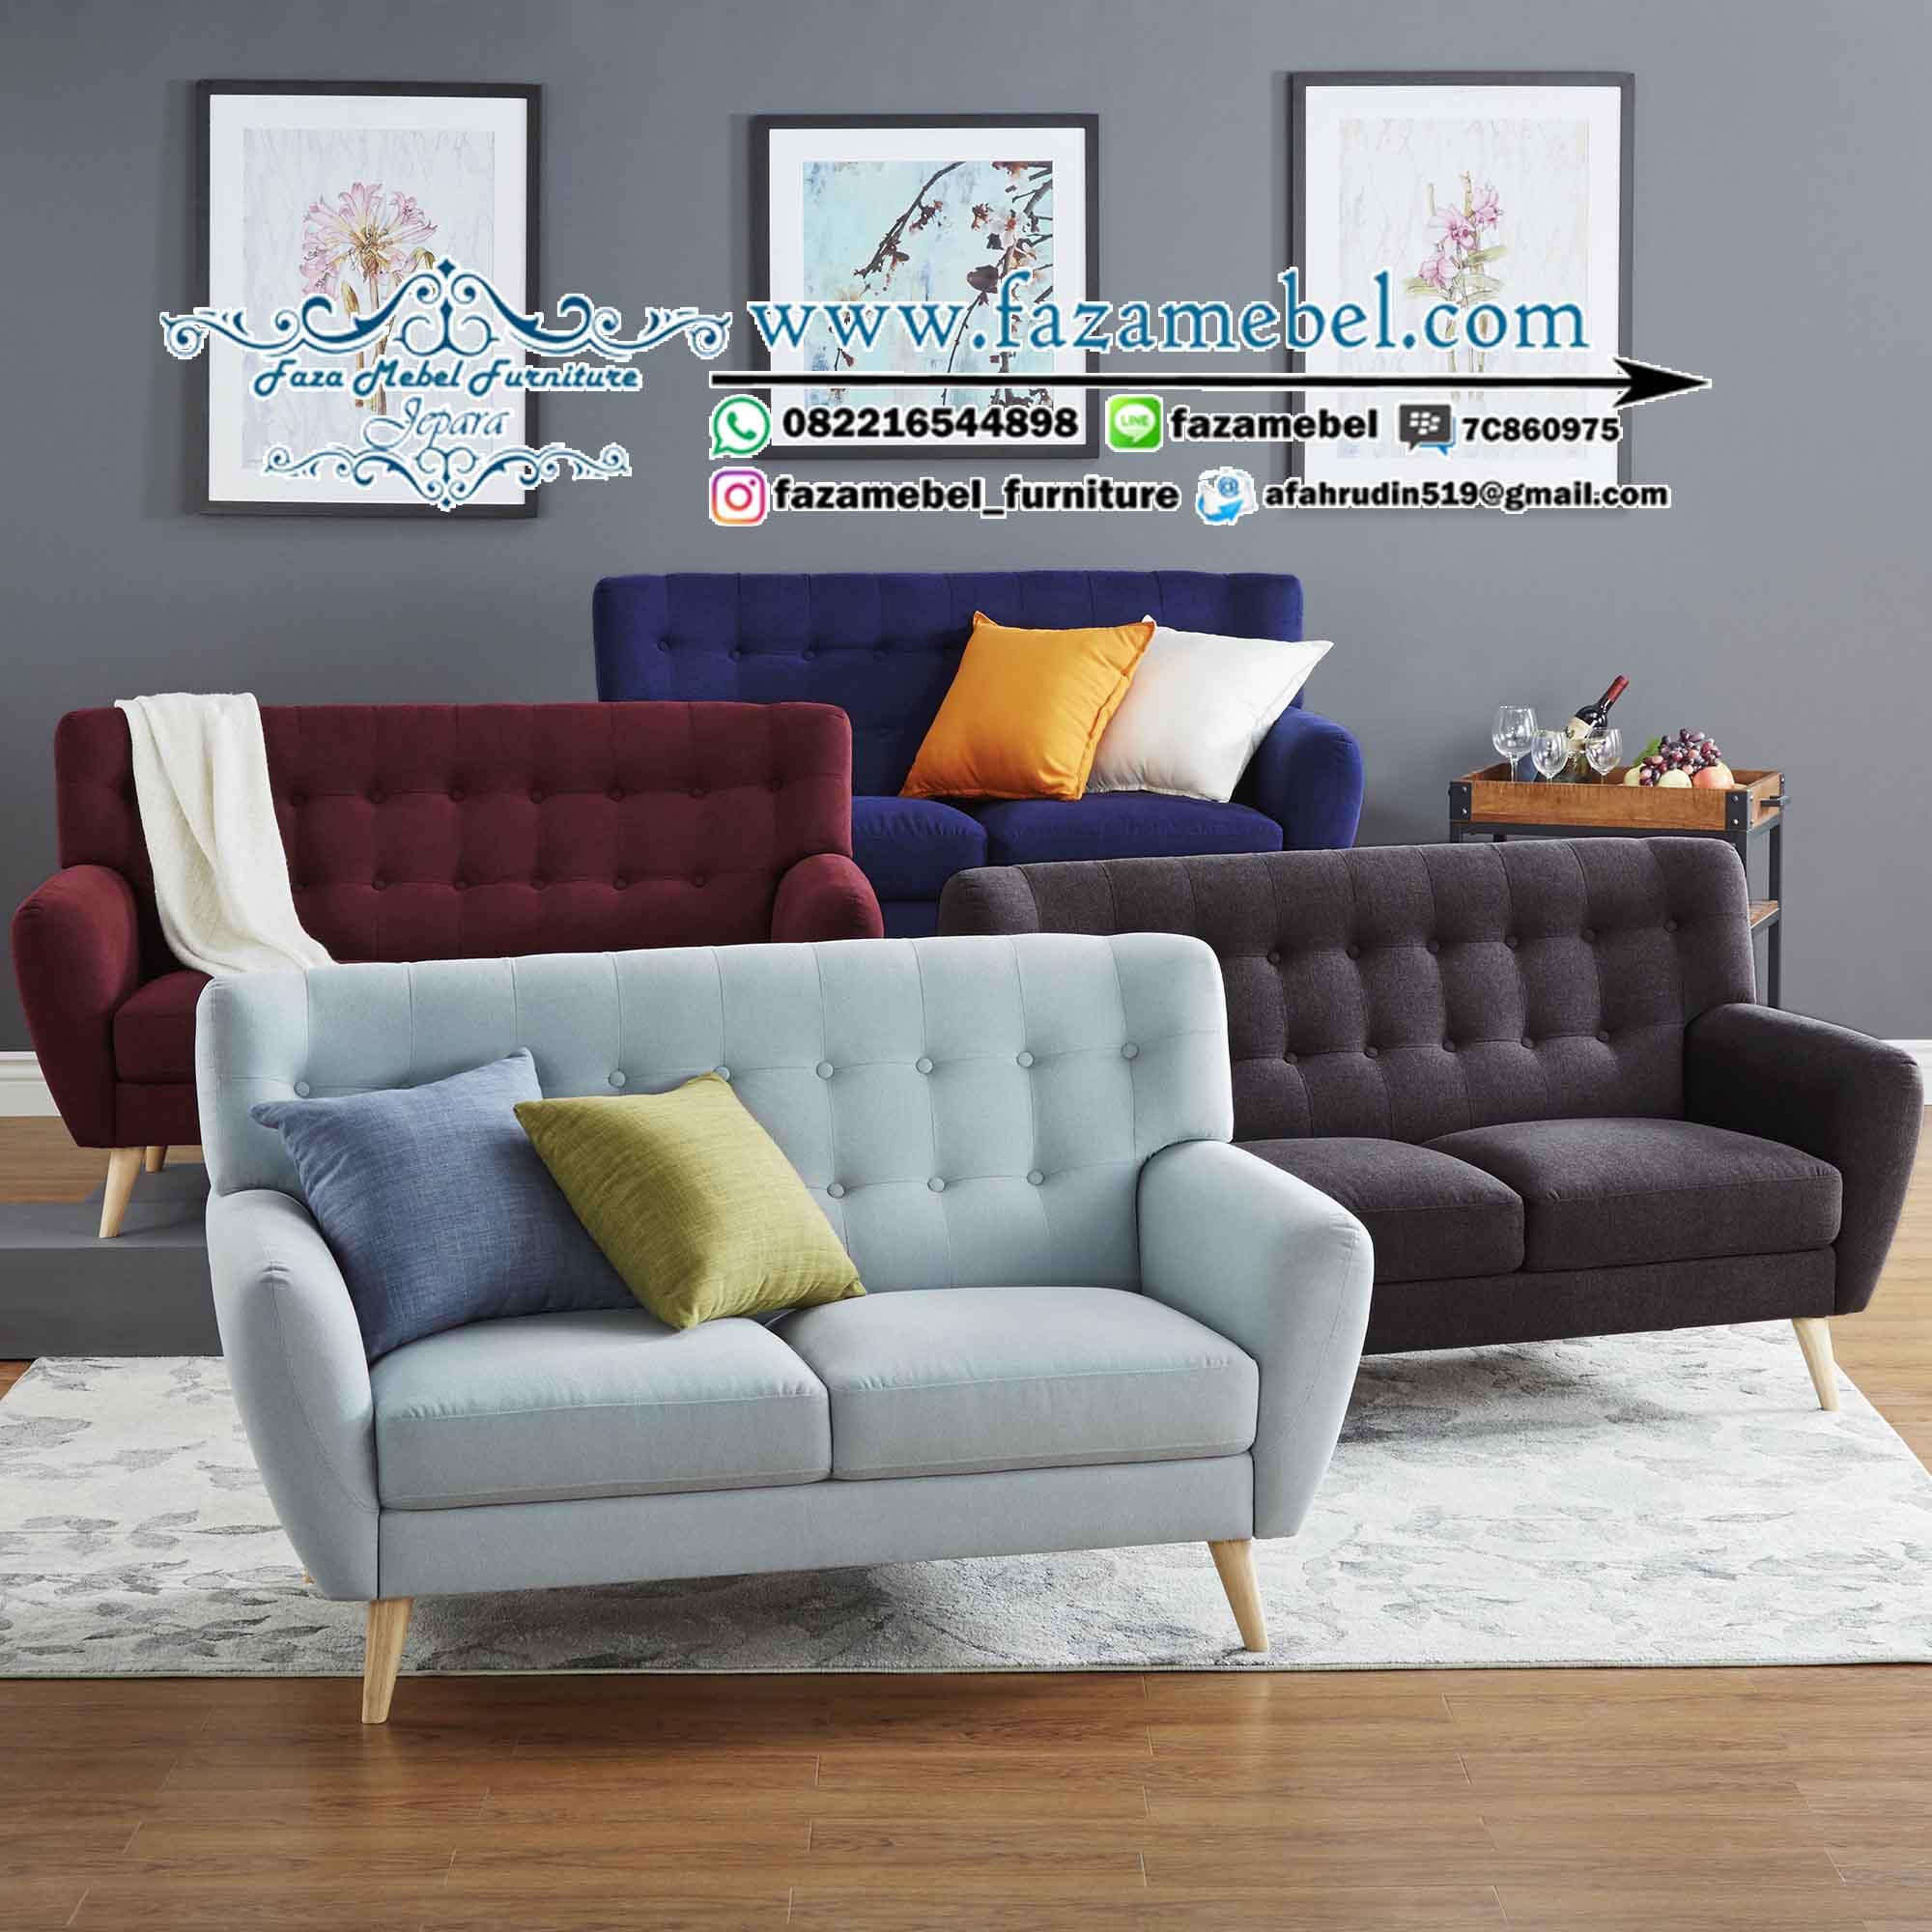 kursi-sofa-tamu-minimalis-modern-terbaru